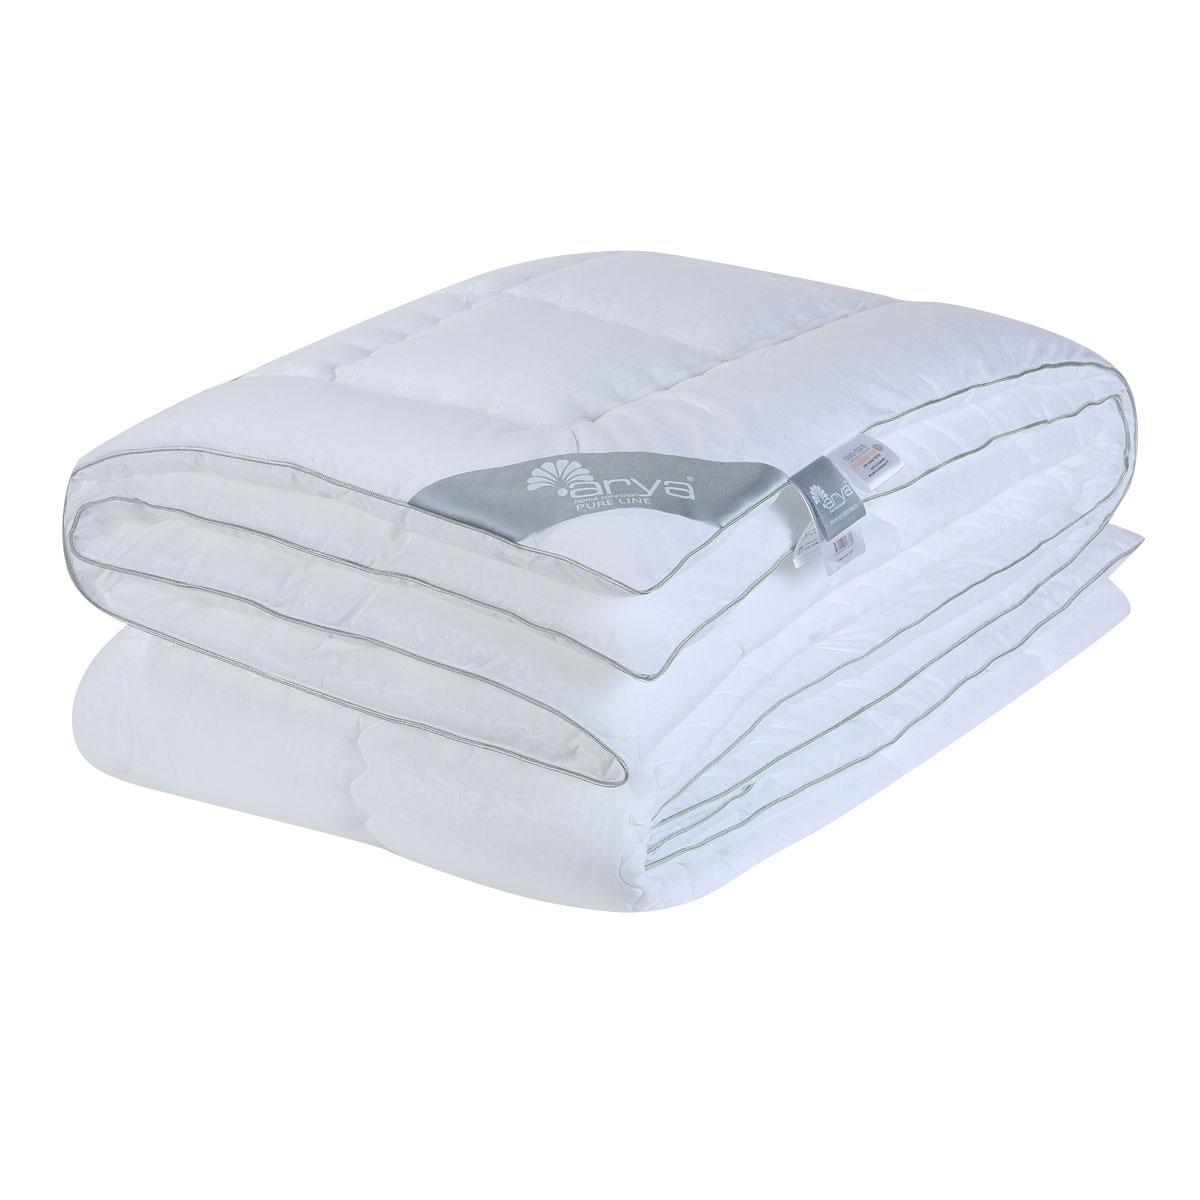 Одеяло Arya home collection Comfort 215х195 см силиконизированное волокно